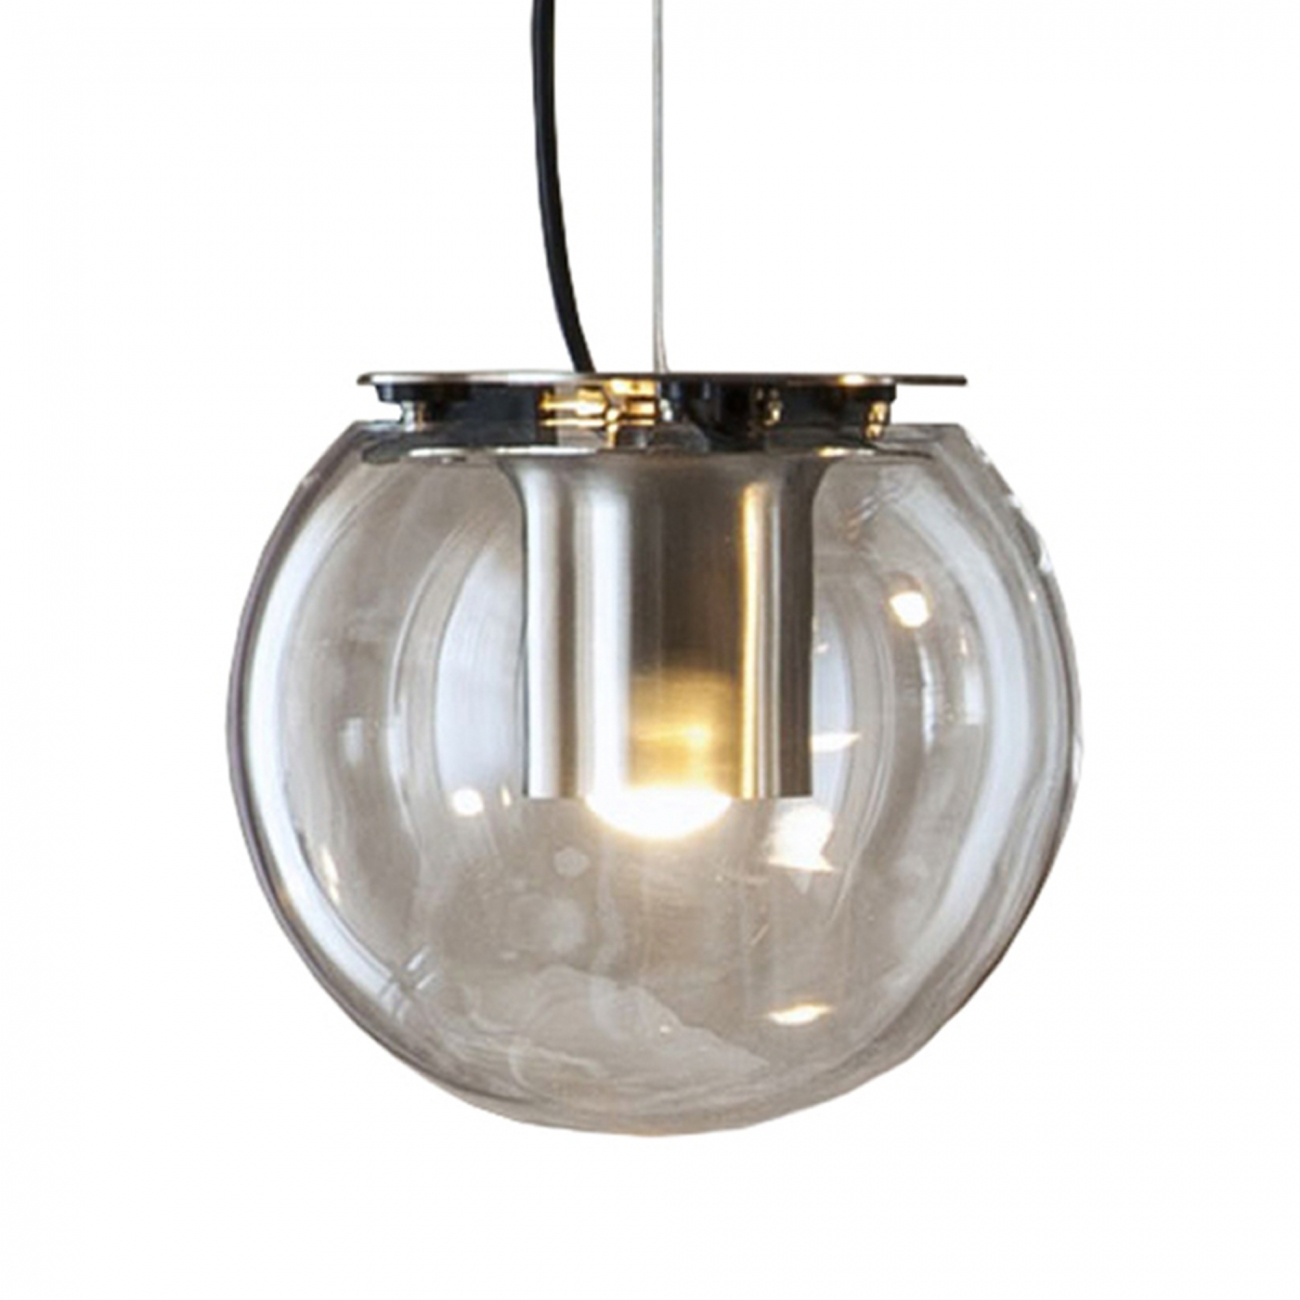 OLuce The Globe 828 Suspension lamp